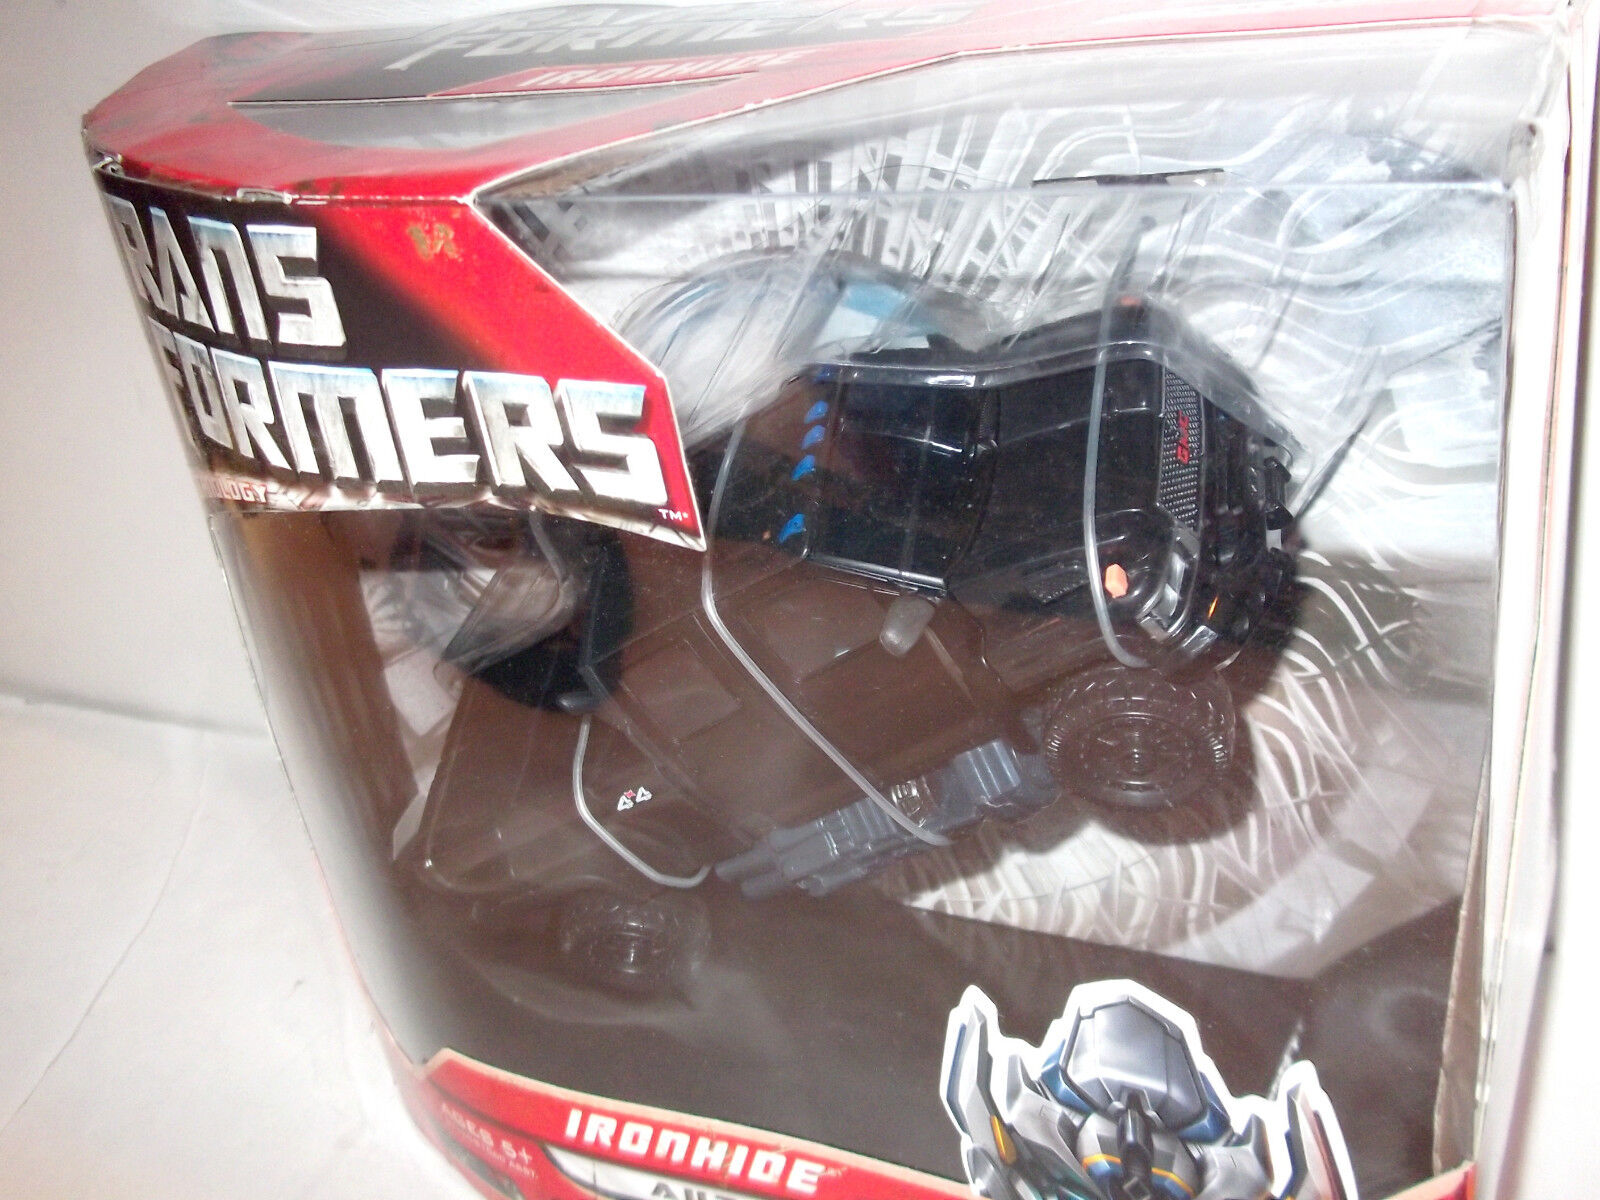 2007 ✰ Movie redF IRONHIDE Voyager (AUTHENTIC USA) Transformers revenge fallen